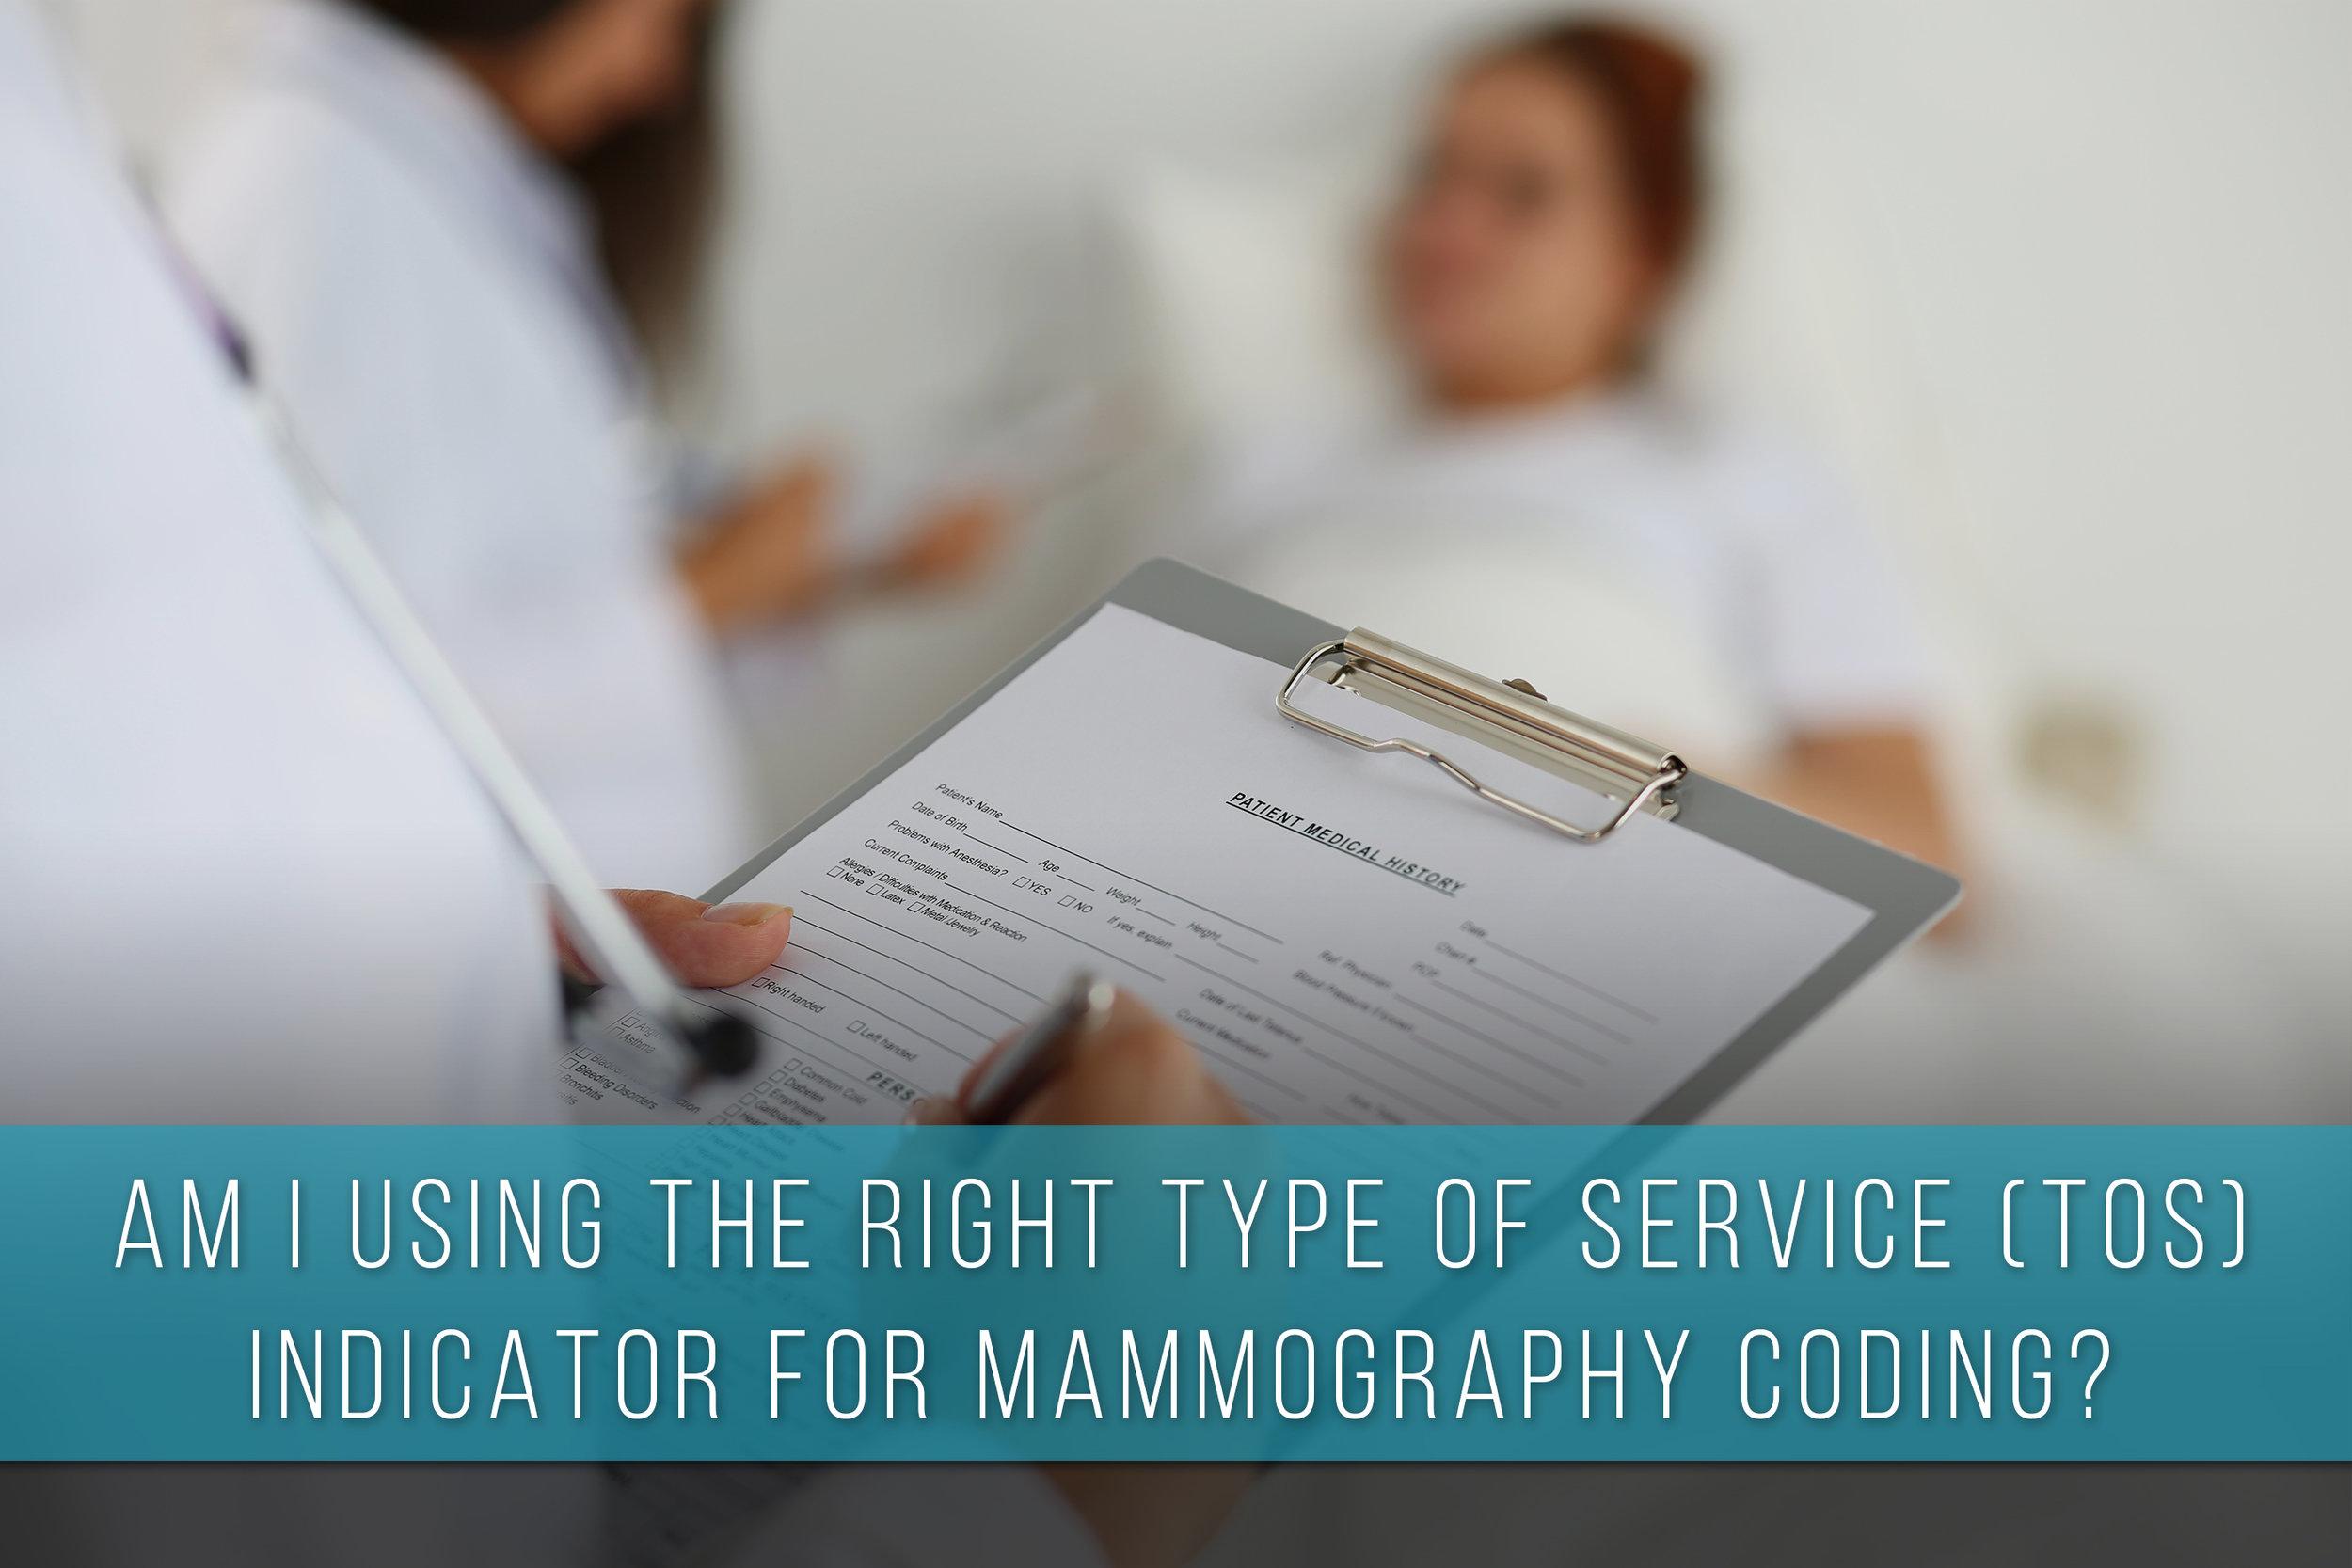 TOS-Mammography.jpg